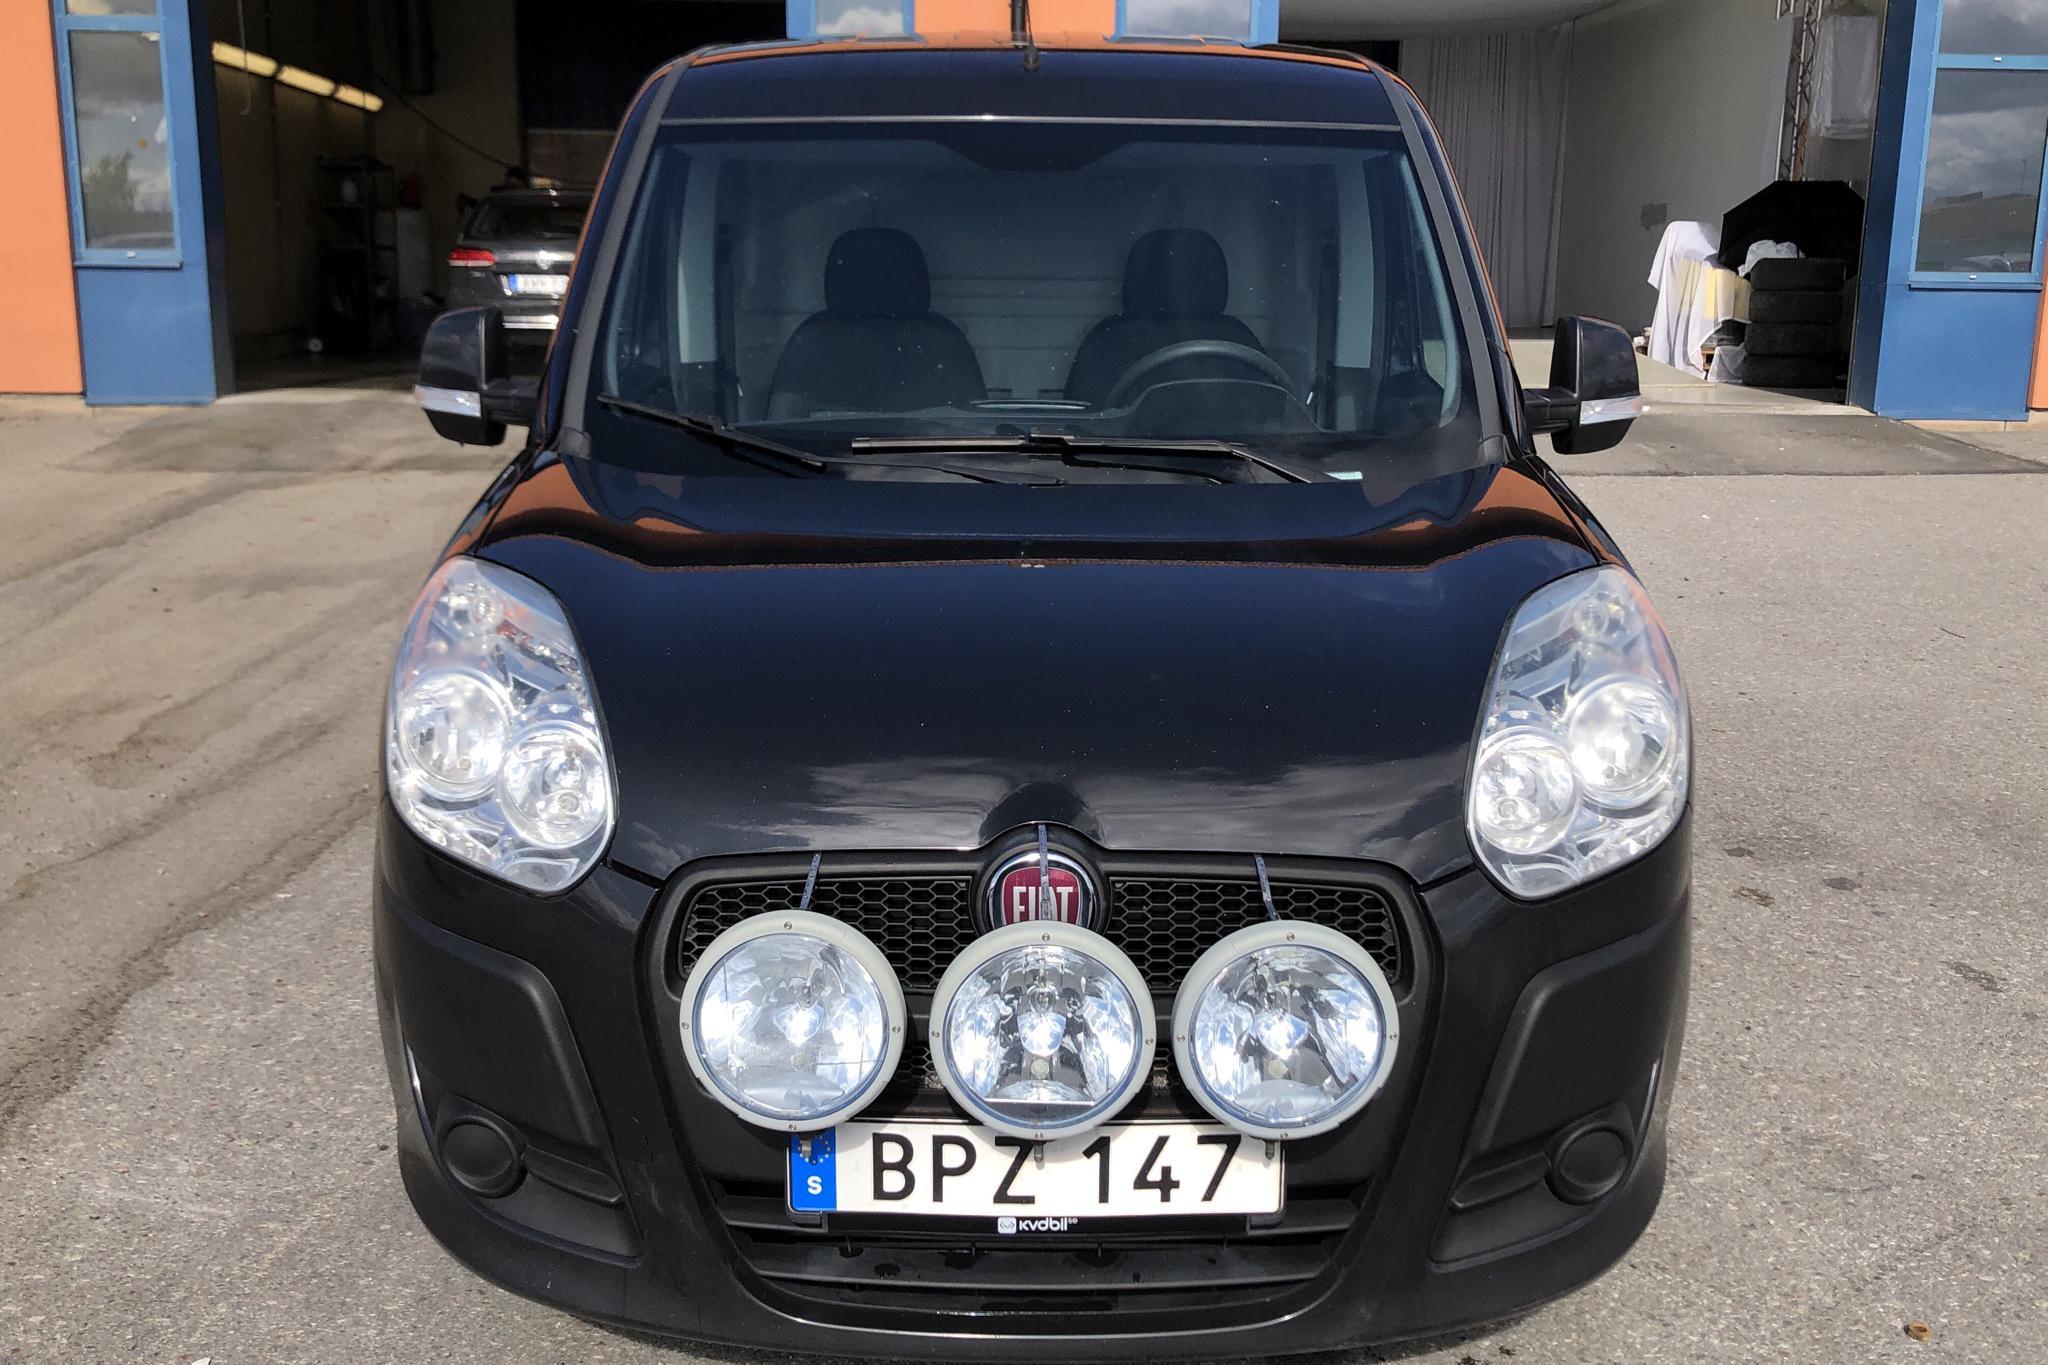 Fiat Doblo Cargo 1.3 Multijet (90hk) - 102 530 km - Manual - black - 2014